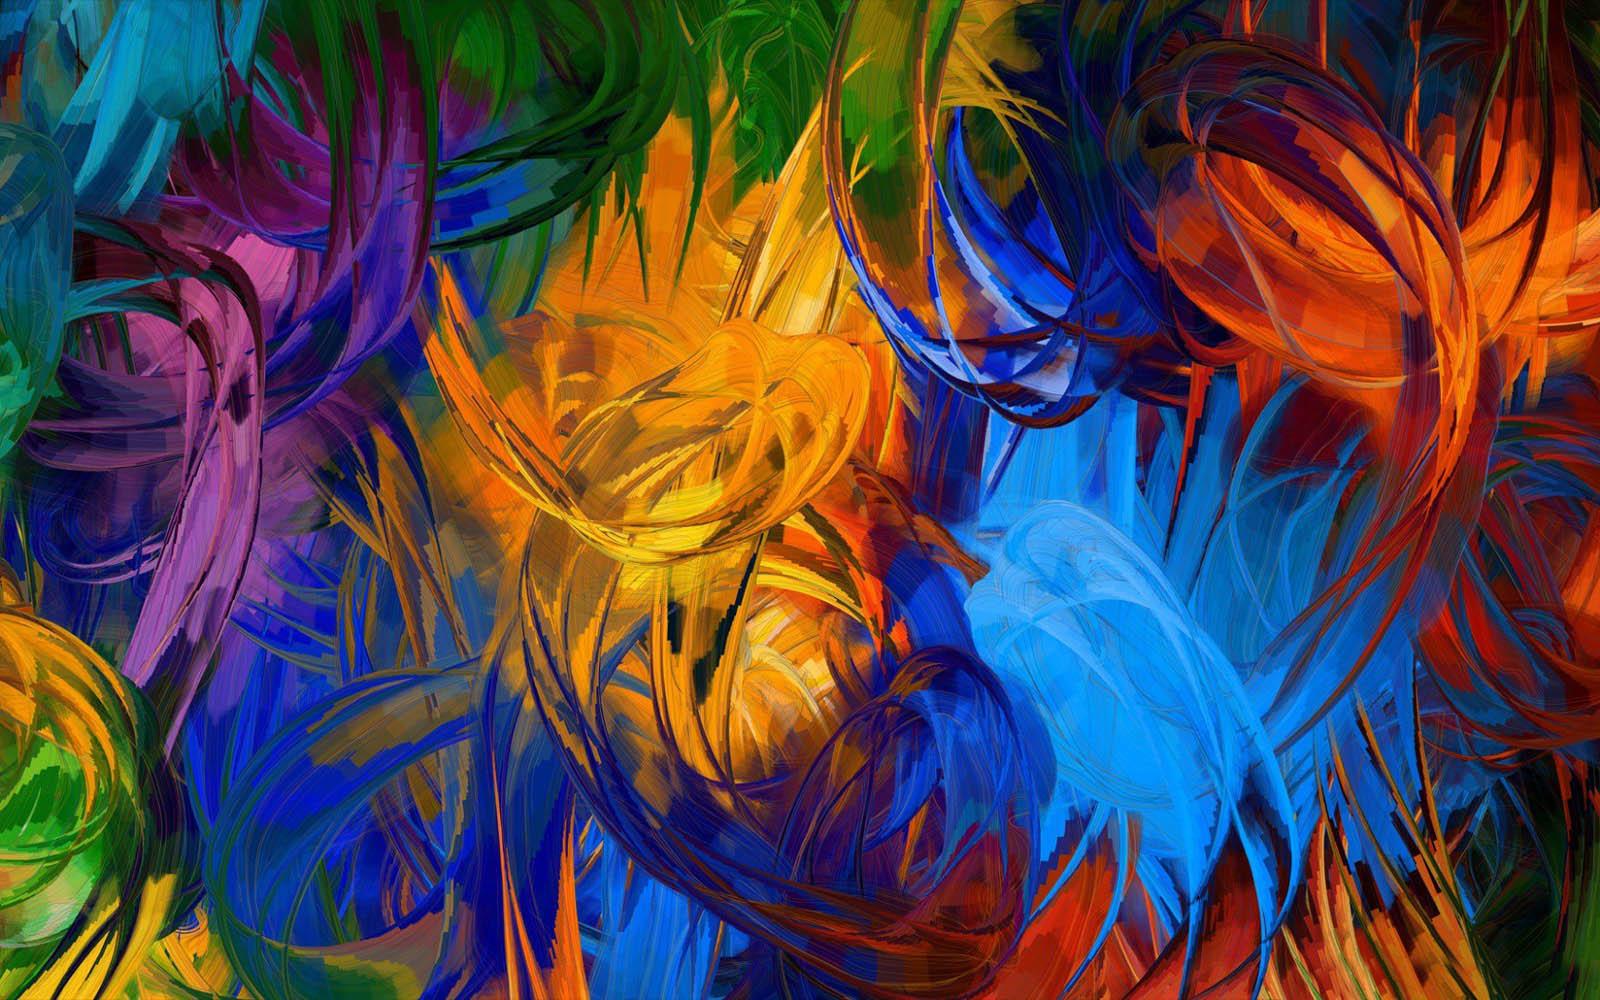 50 ] Free Abstract Art Wallpaper On WallpaperSafari